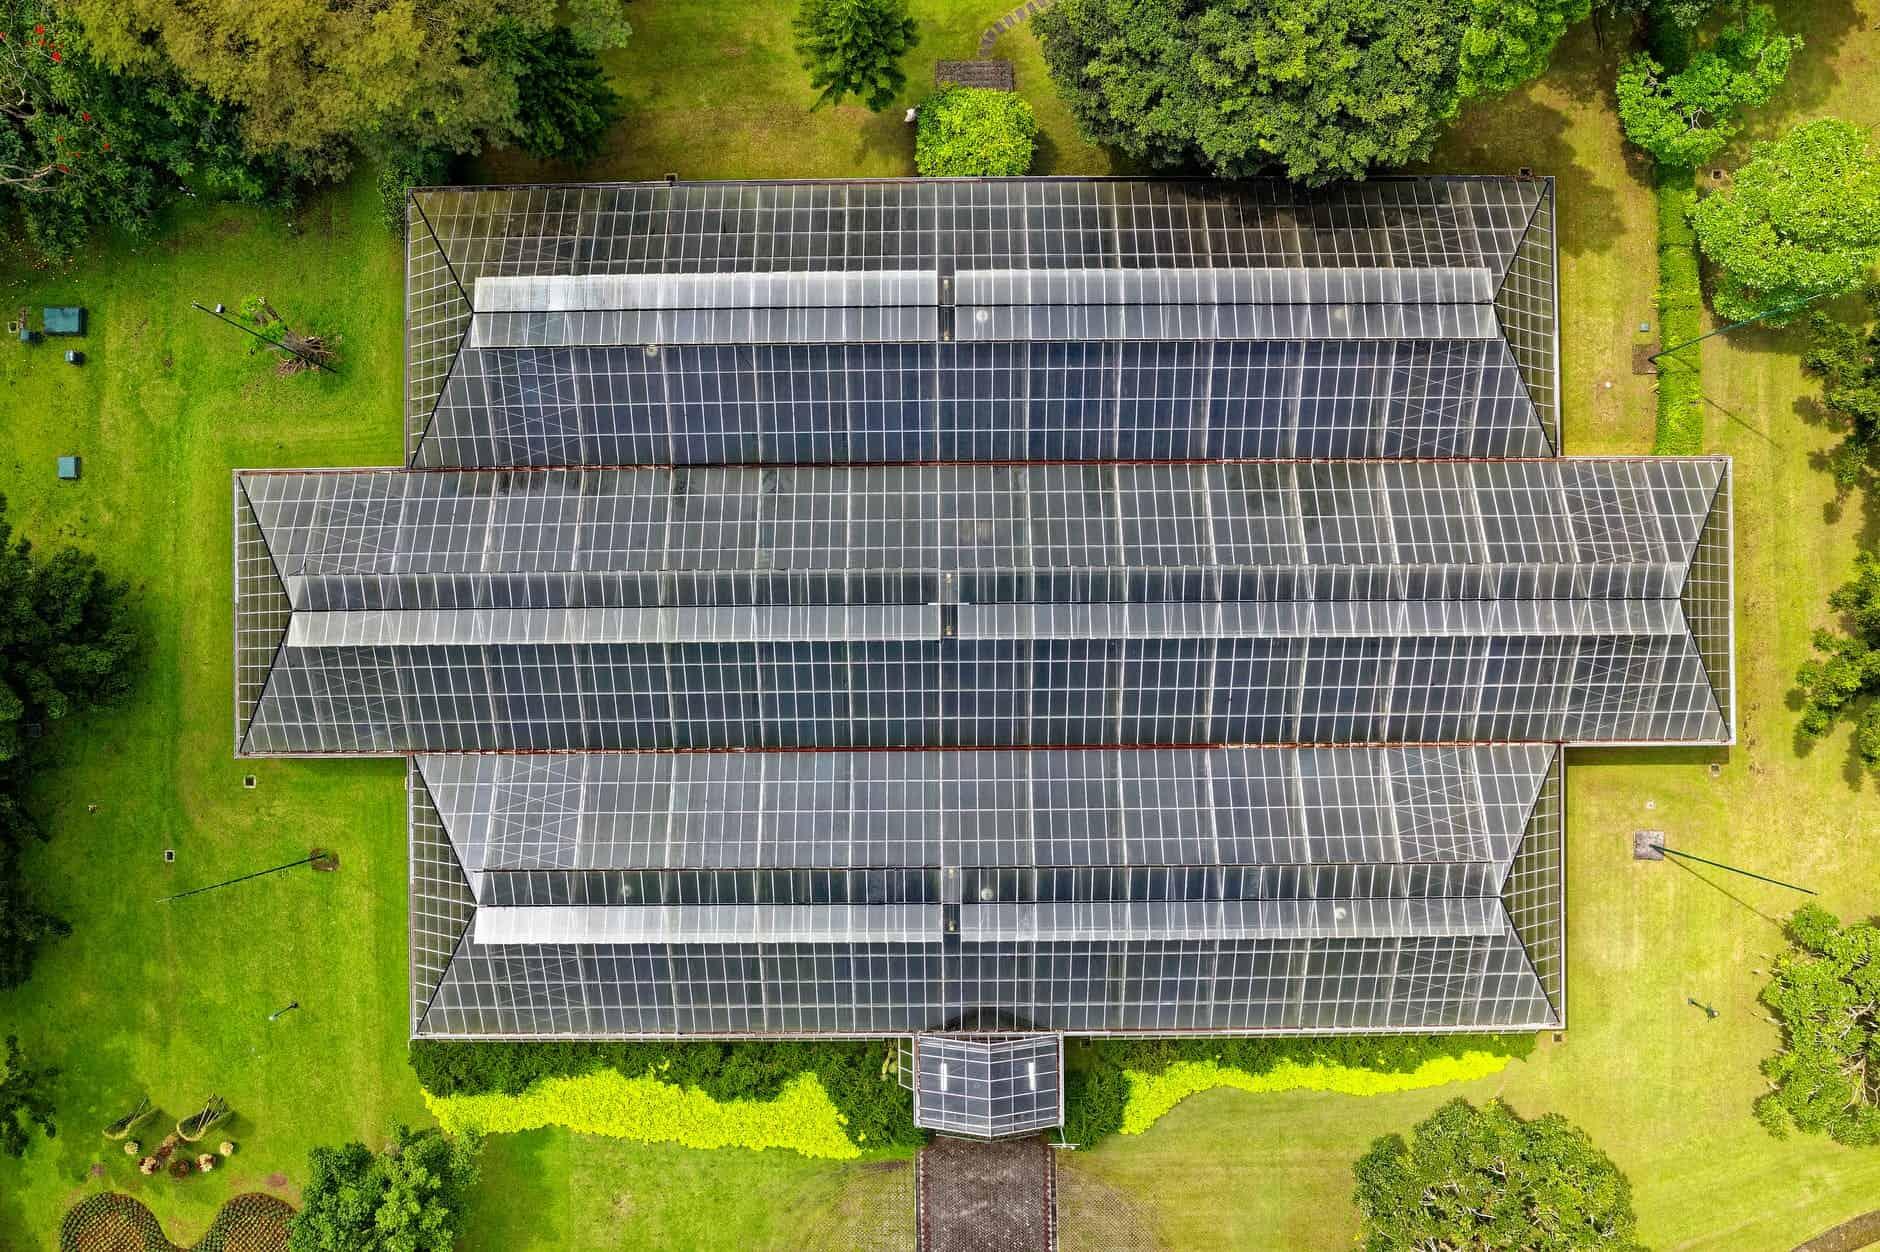 eficiencia energetica em armazens